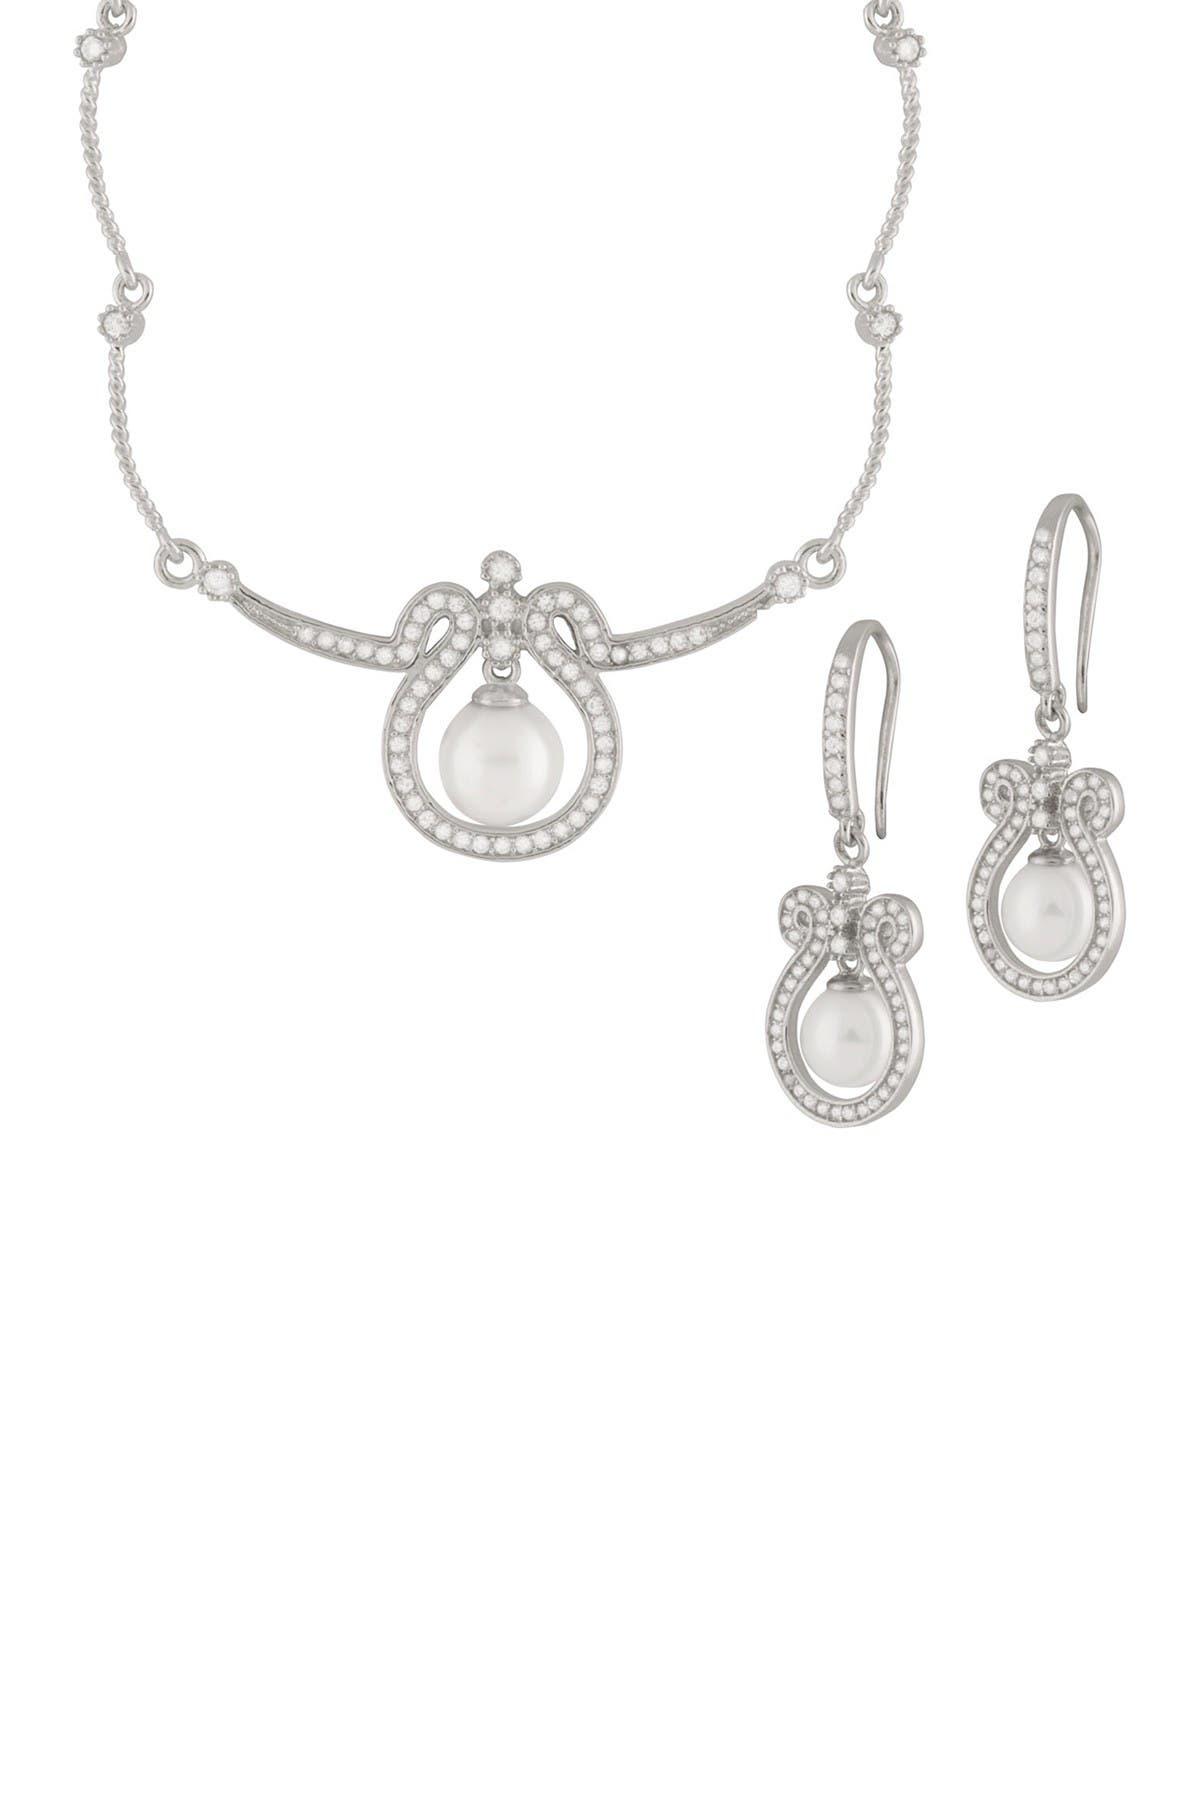 Image of Splendid Pearls 7-8mm White Freshwater Pearl & CZ Set